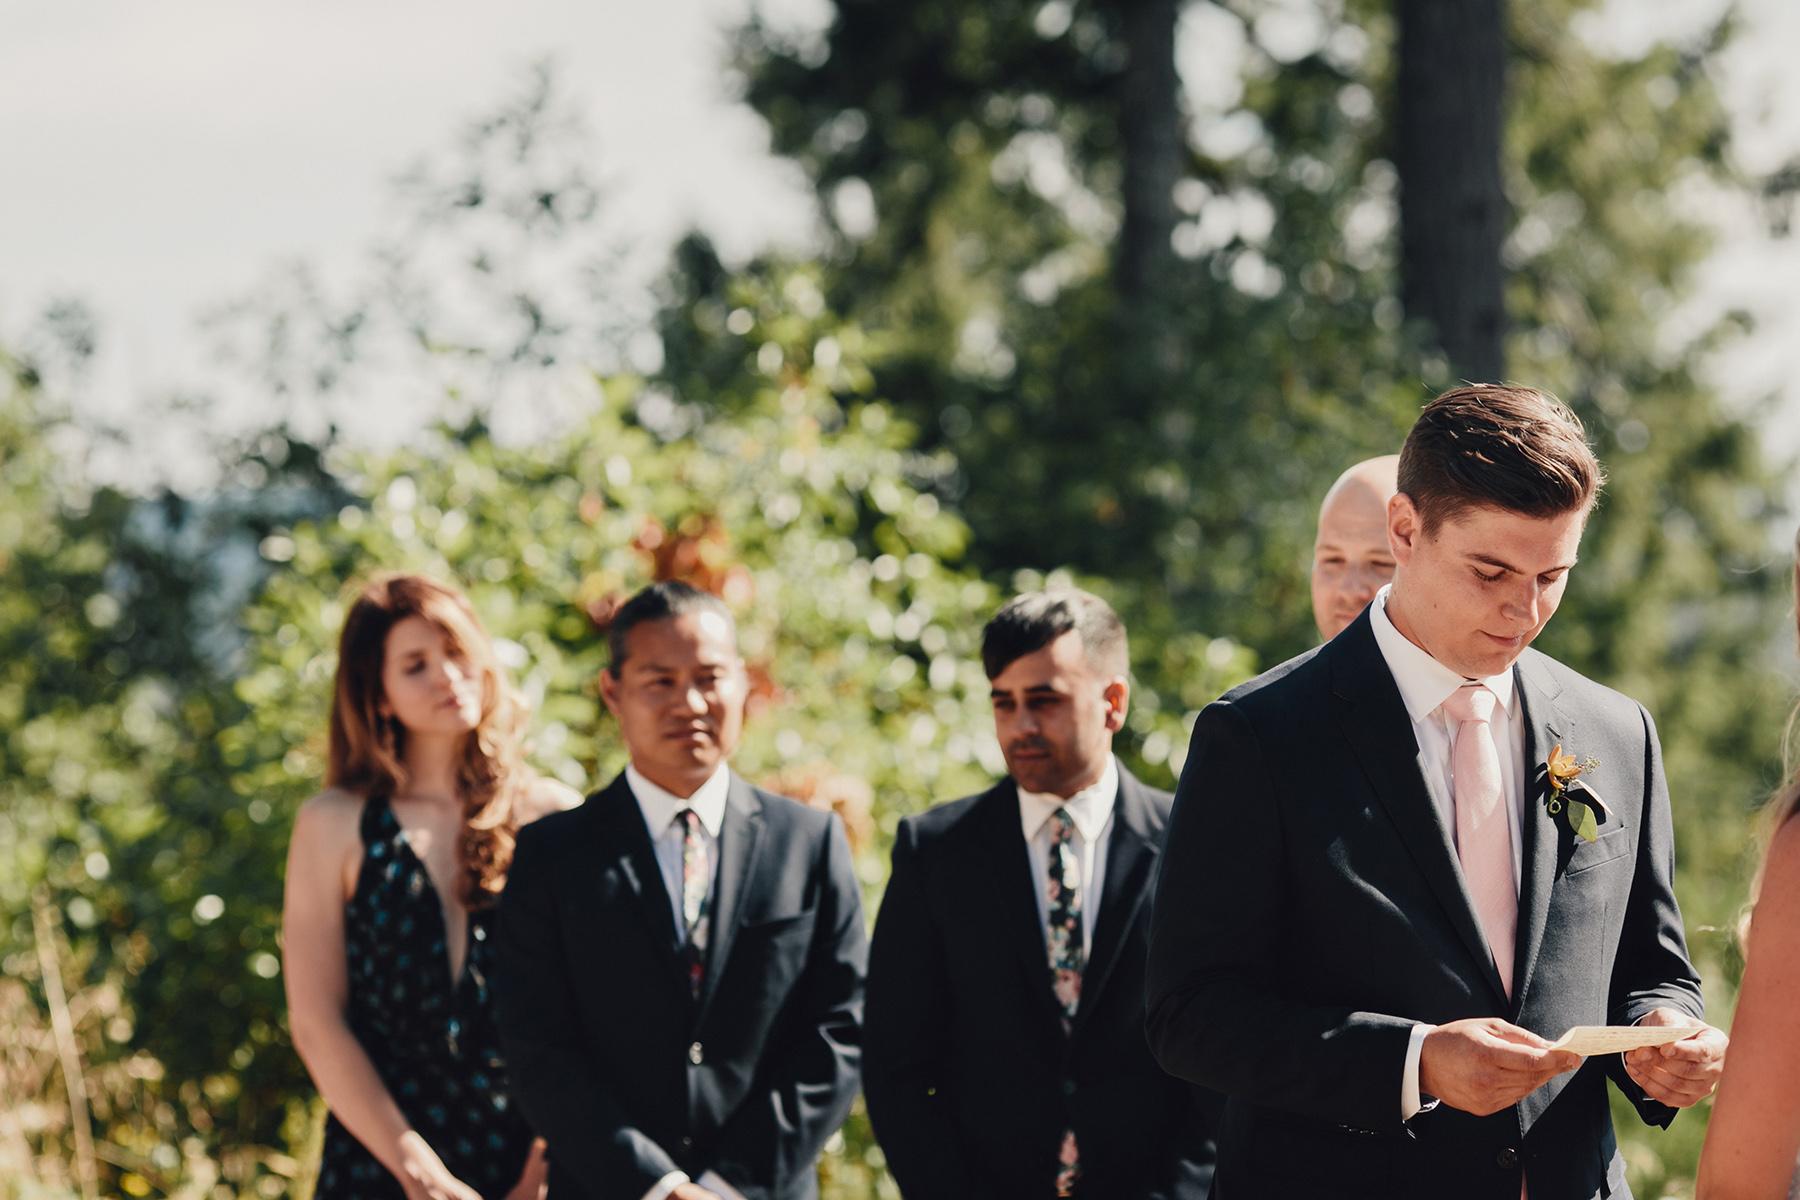 bodega-ridge-wedding-photos-0073.jpg